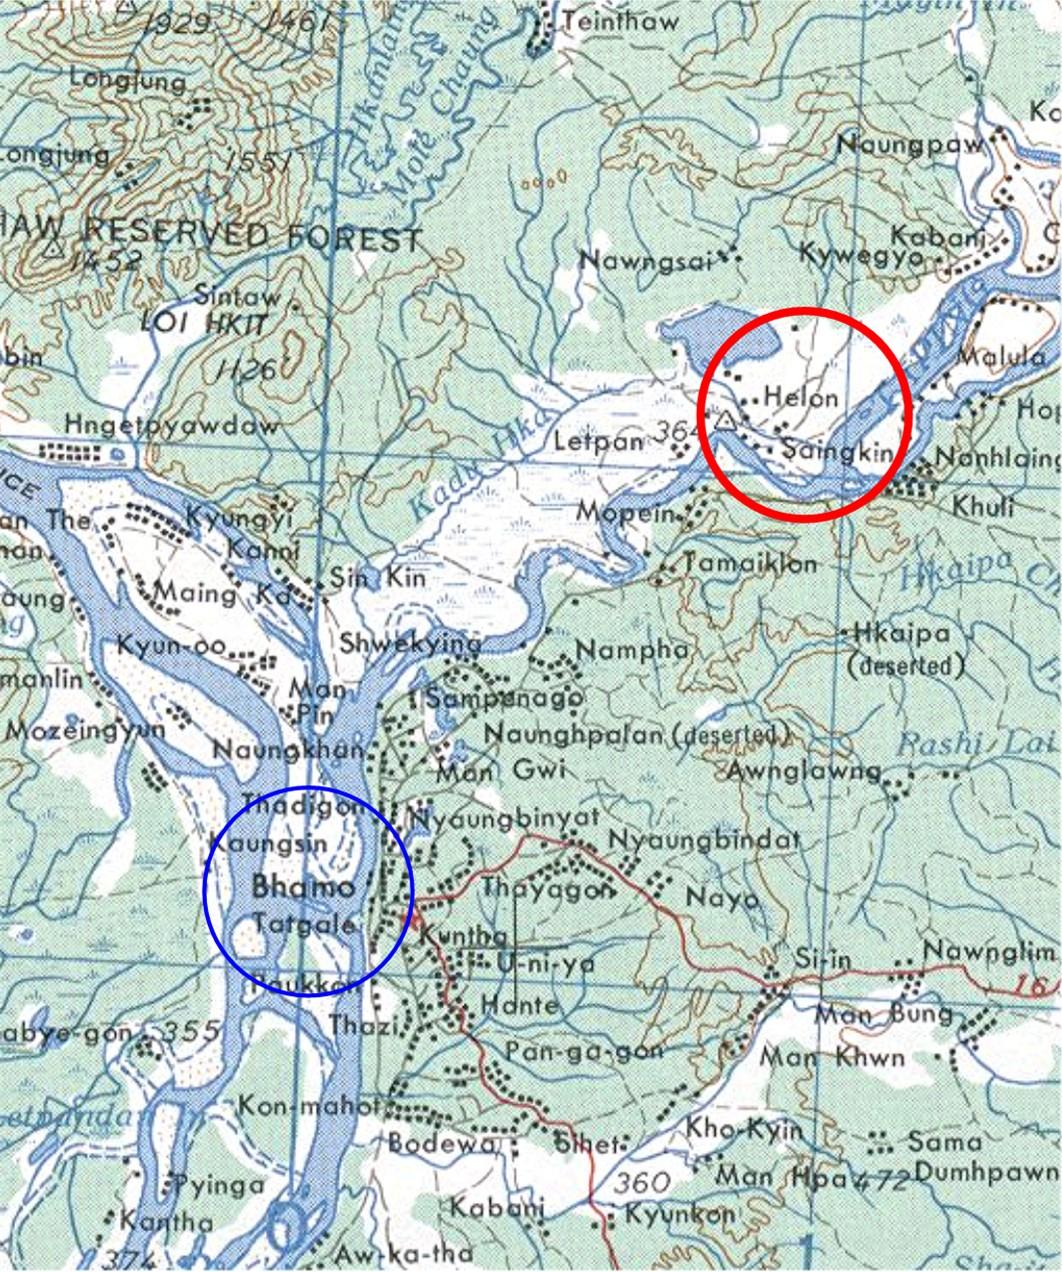 File:HELON Town, Bhamo District, Kachin State, Burma.jpg ... on northern california state counties map, karen state myanmar map, kayin state myanmar map, northern part of united states map, mon state myanmar map, rakhine state myanmar map, chin state myanmar map,